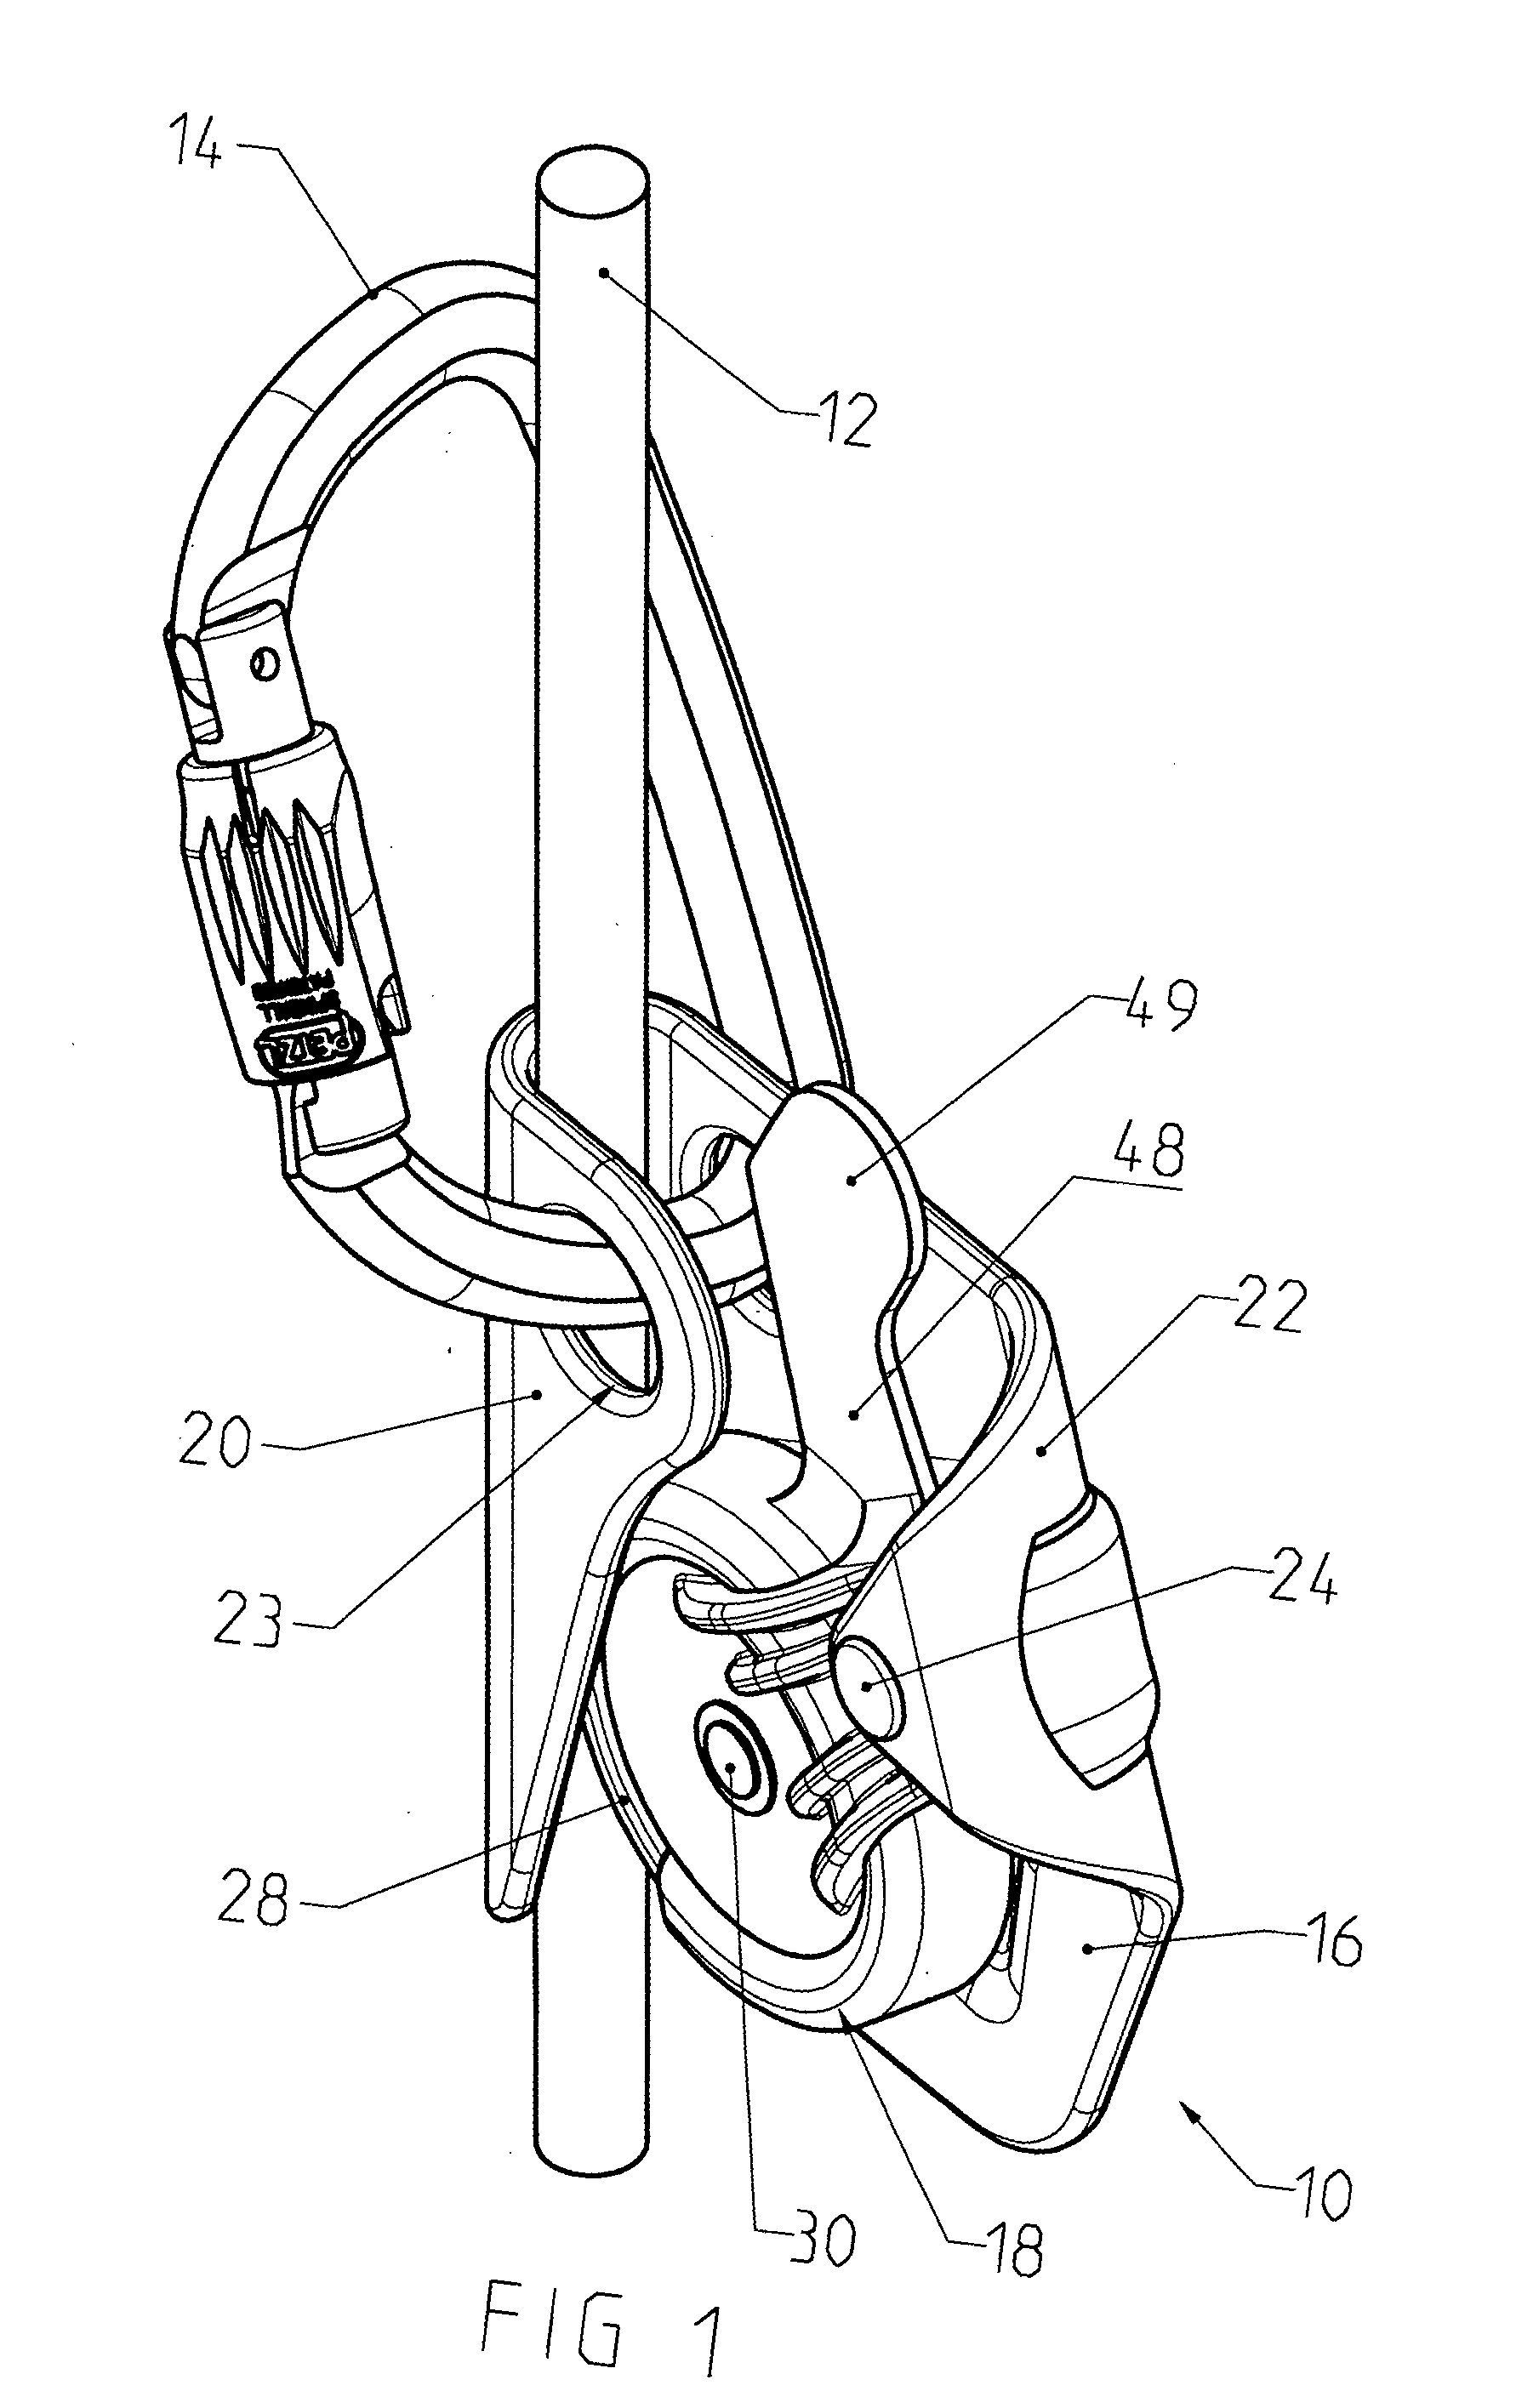 menards safety harness  menards  get free image about